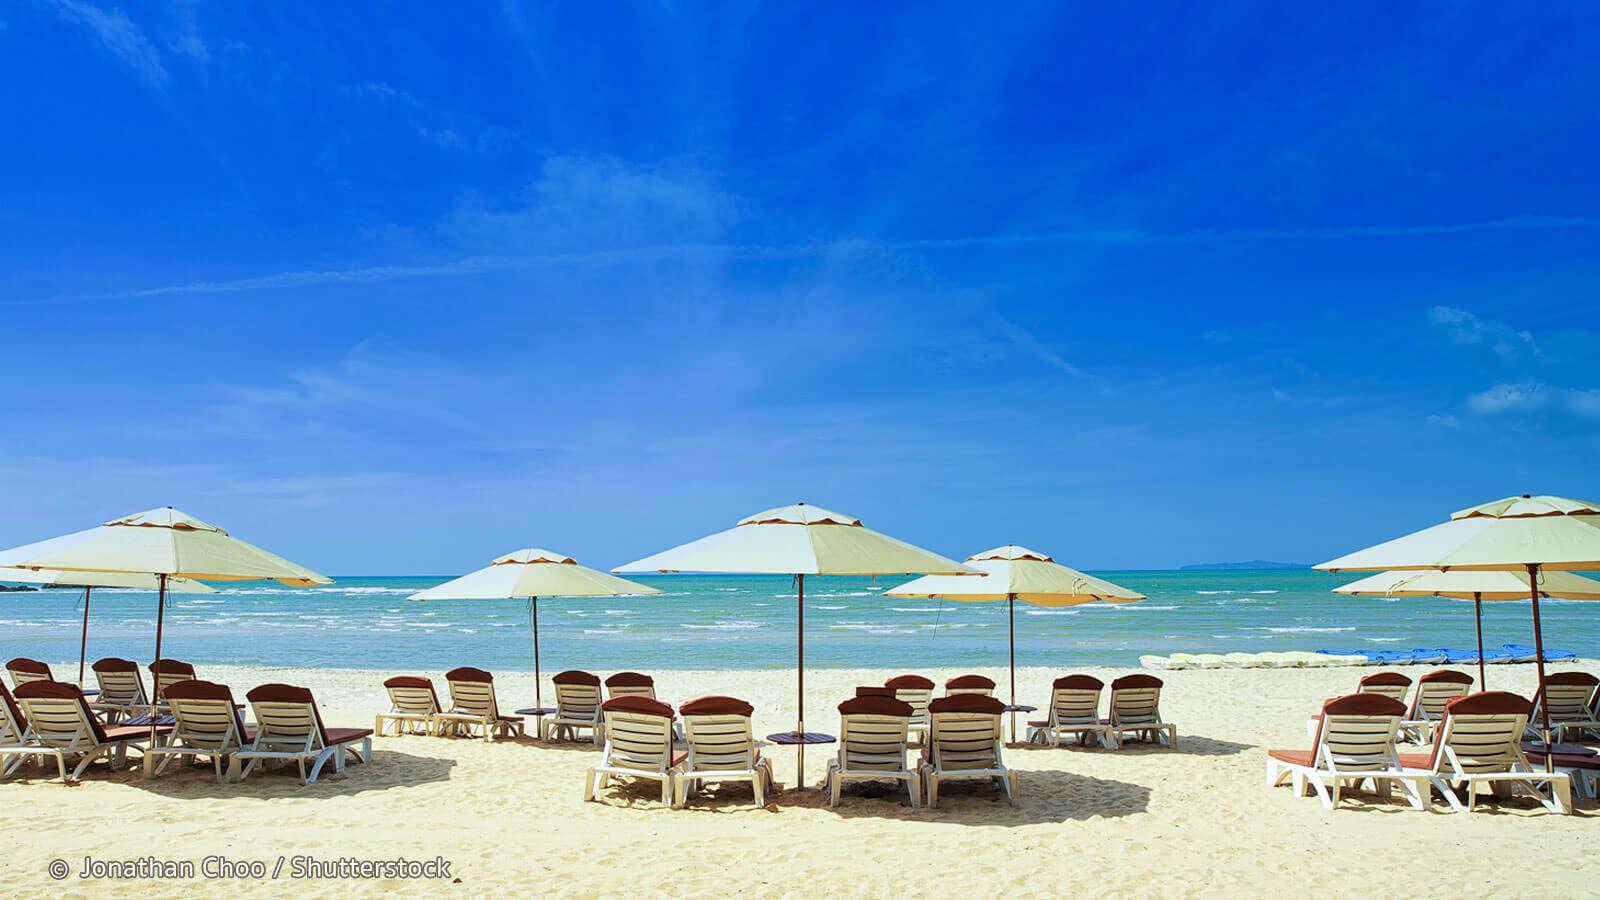 visit the beautiful beach